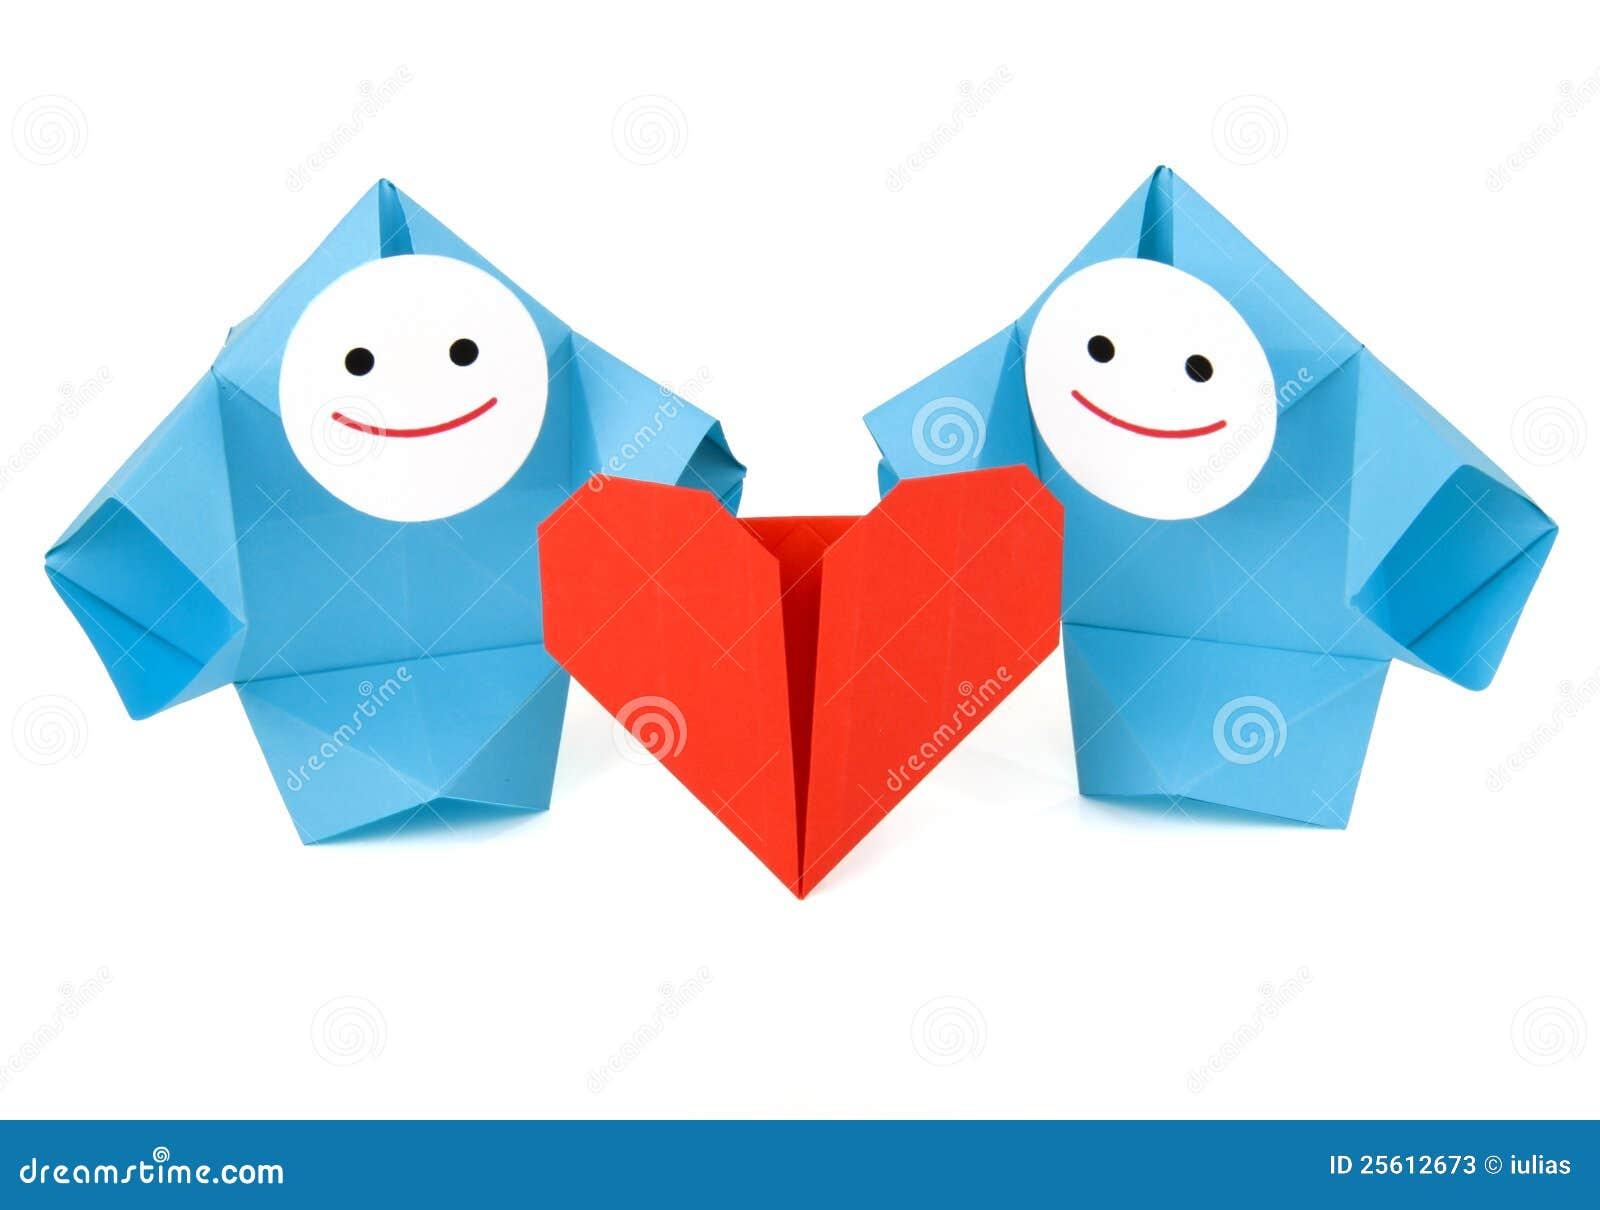 Romantic relationship, love, and greeting metaphor